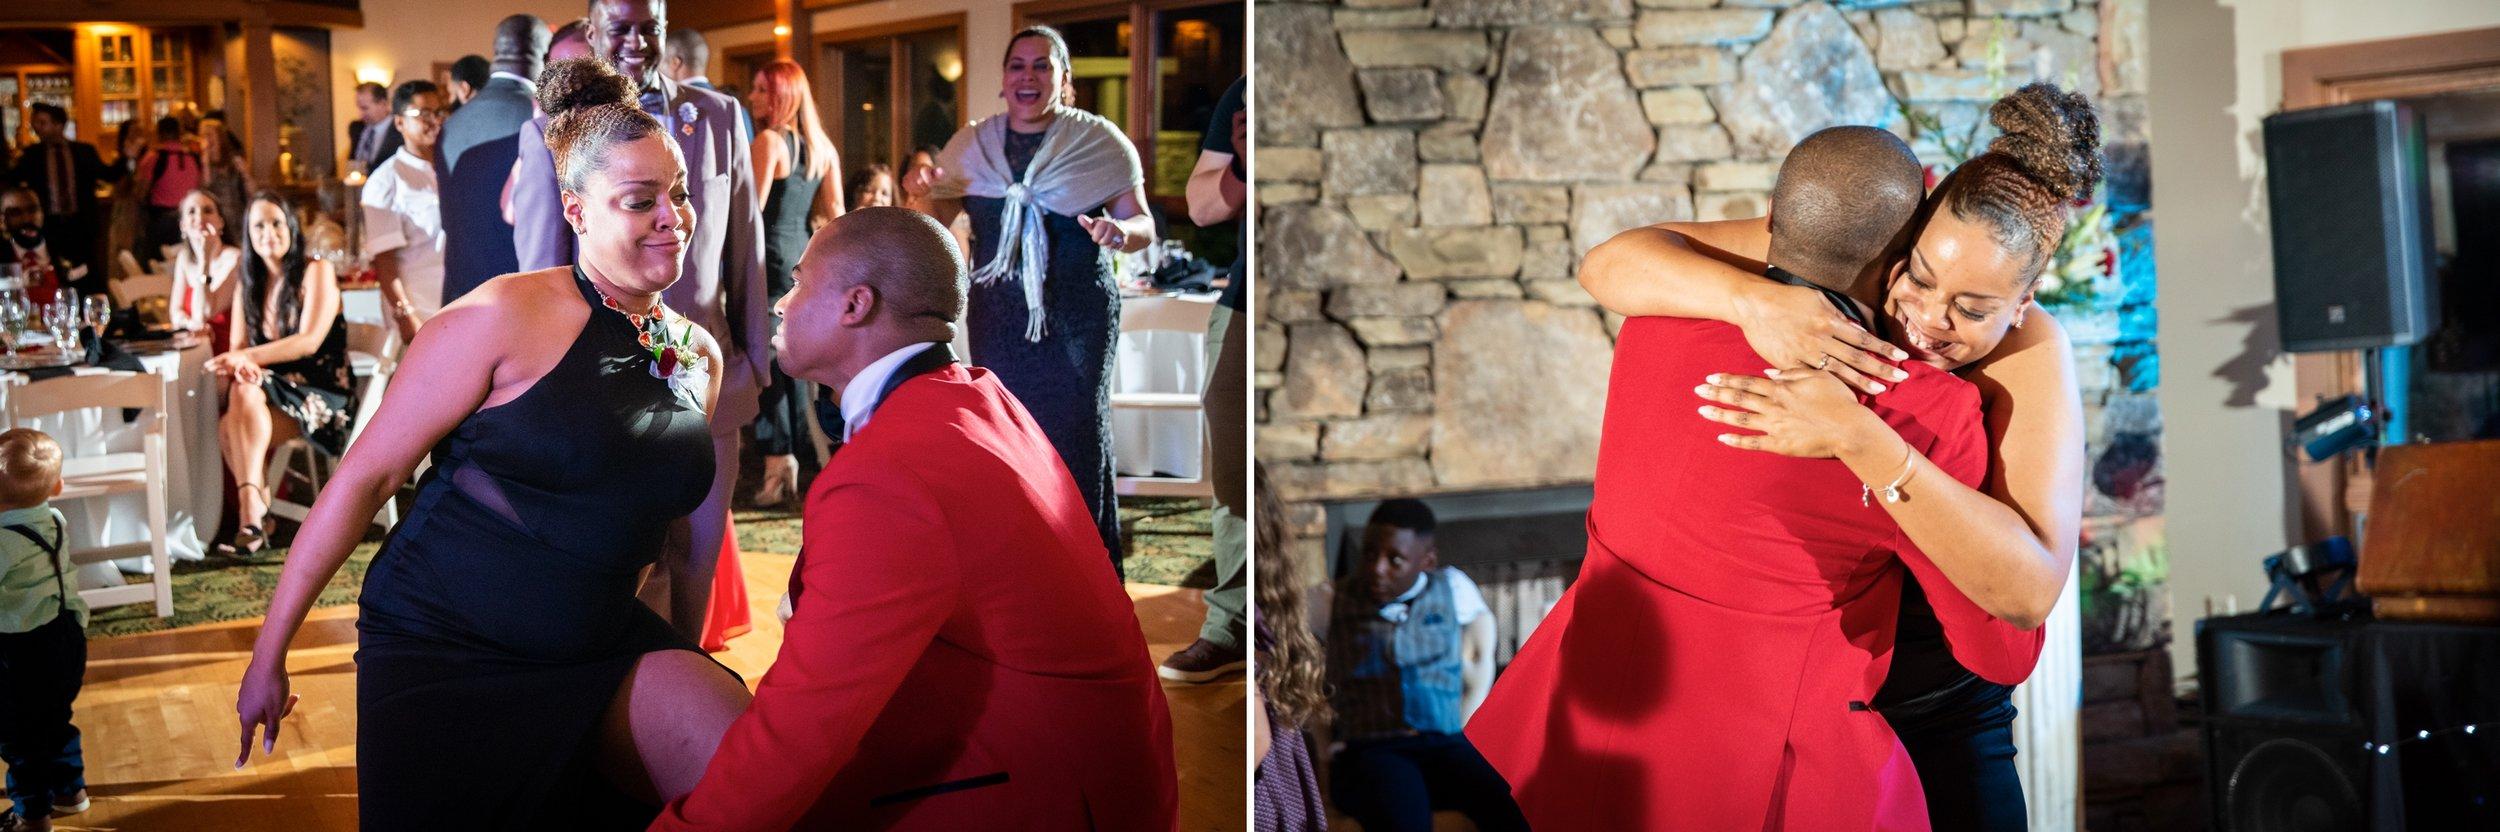 High Vista Weddings - Asheville Vendors 3 43.jpg